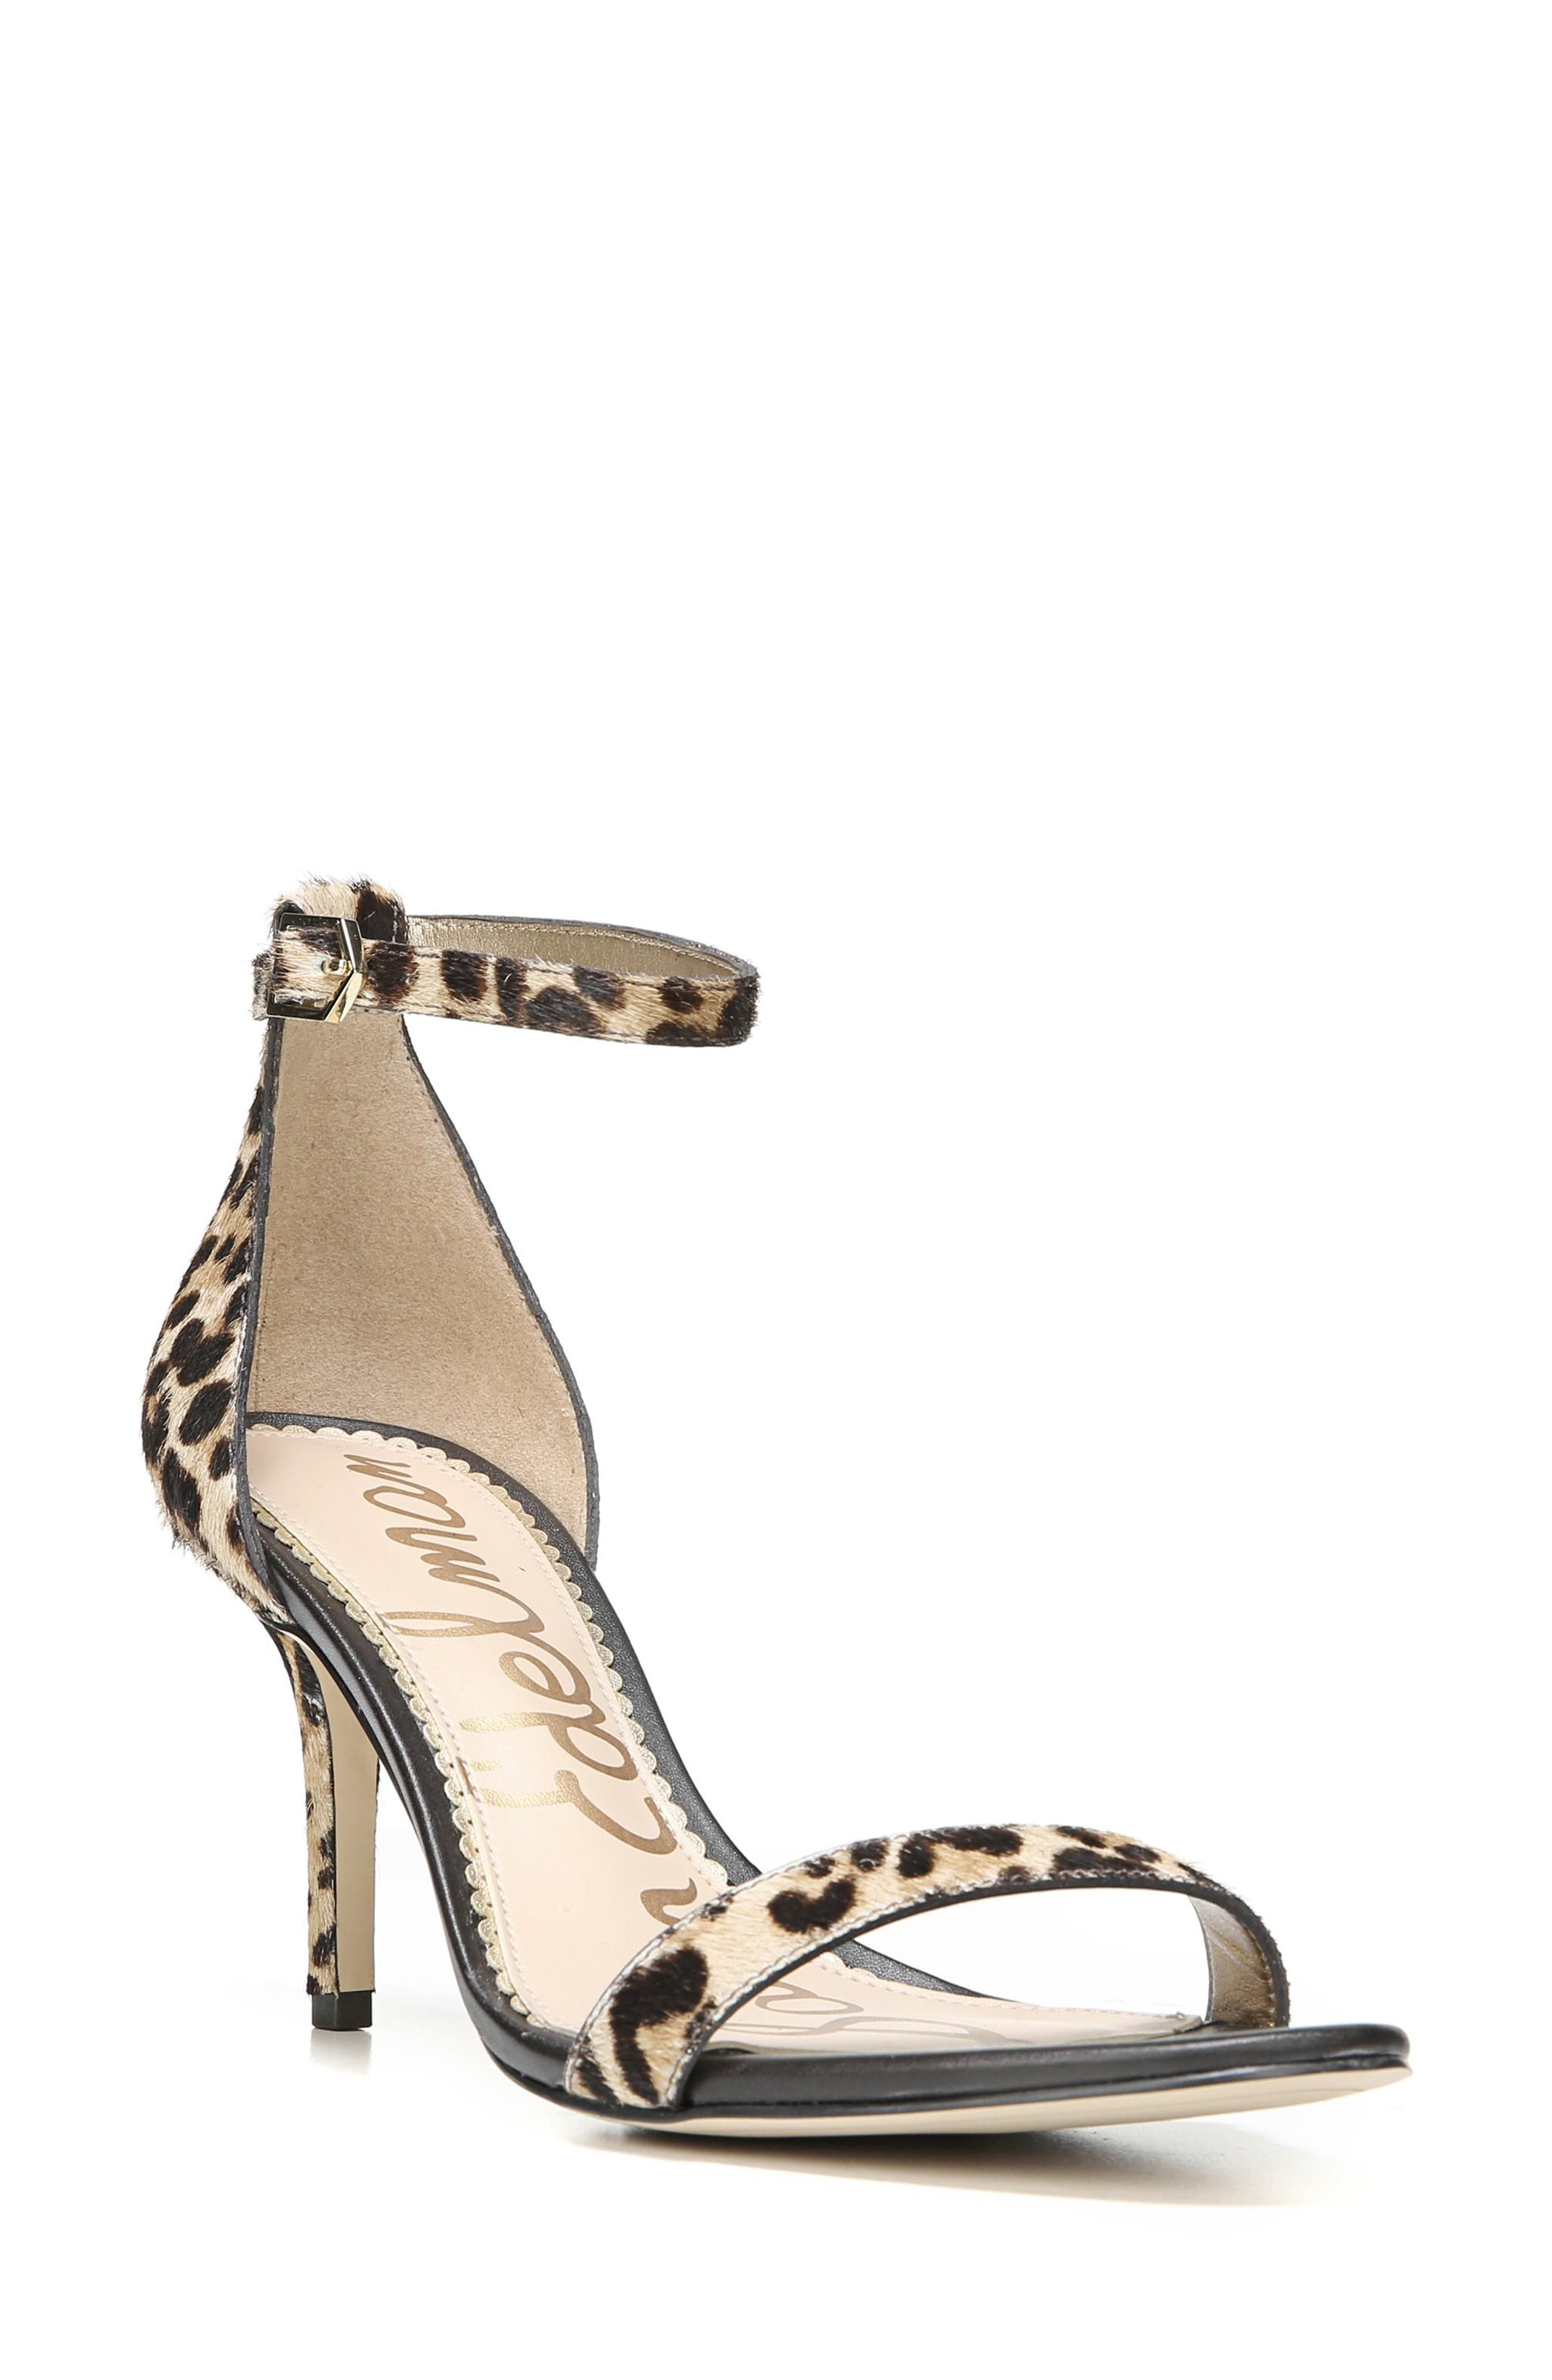 a02e89569091 Sam Edelman Women s Patti Open Toe Leopard-Print Calf Hair High-Heel Sandals  In